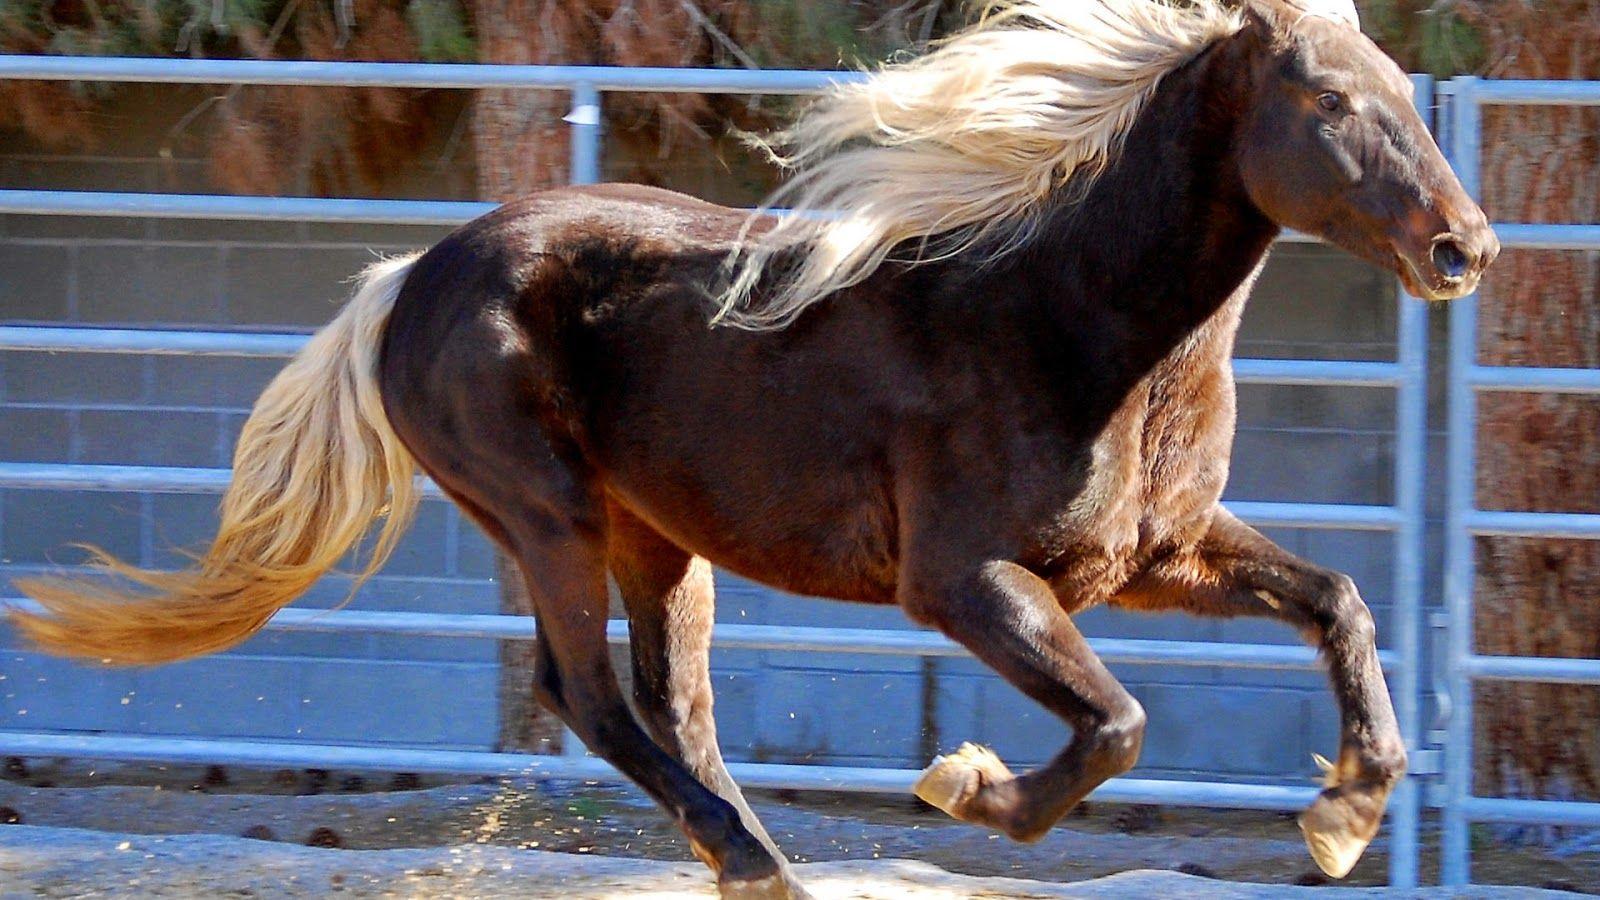 Wonderful Wallpaper Horse Laptop - f6640294f24fc15bfb5eab66a8601b51  2018_882955.jpg